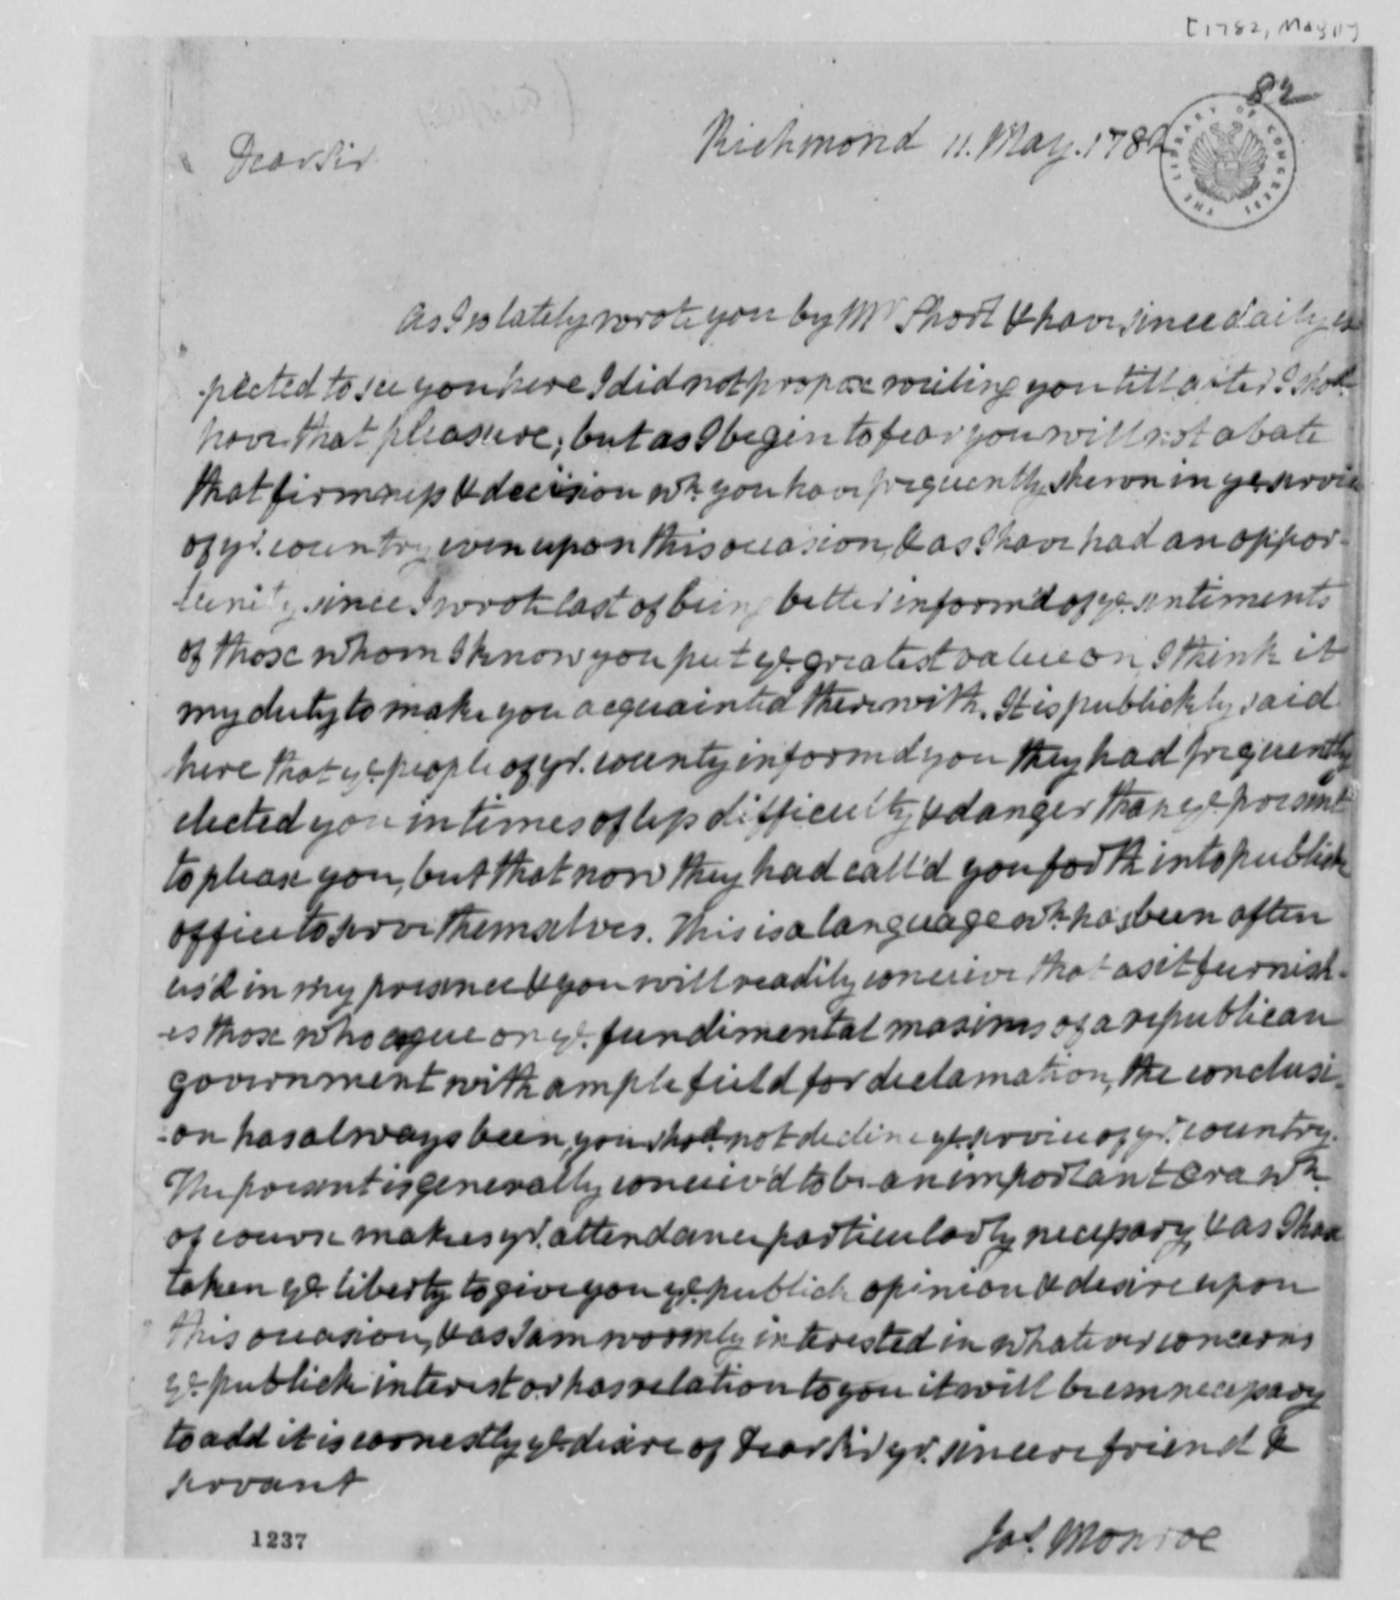 James Monroe to Thomas Jefferson, May 11, 1782